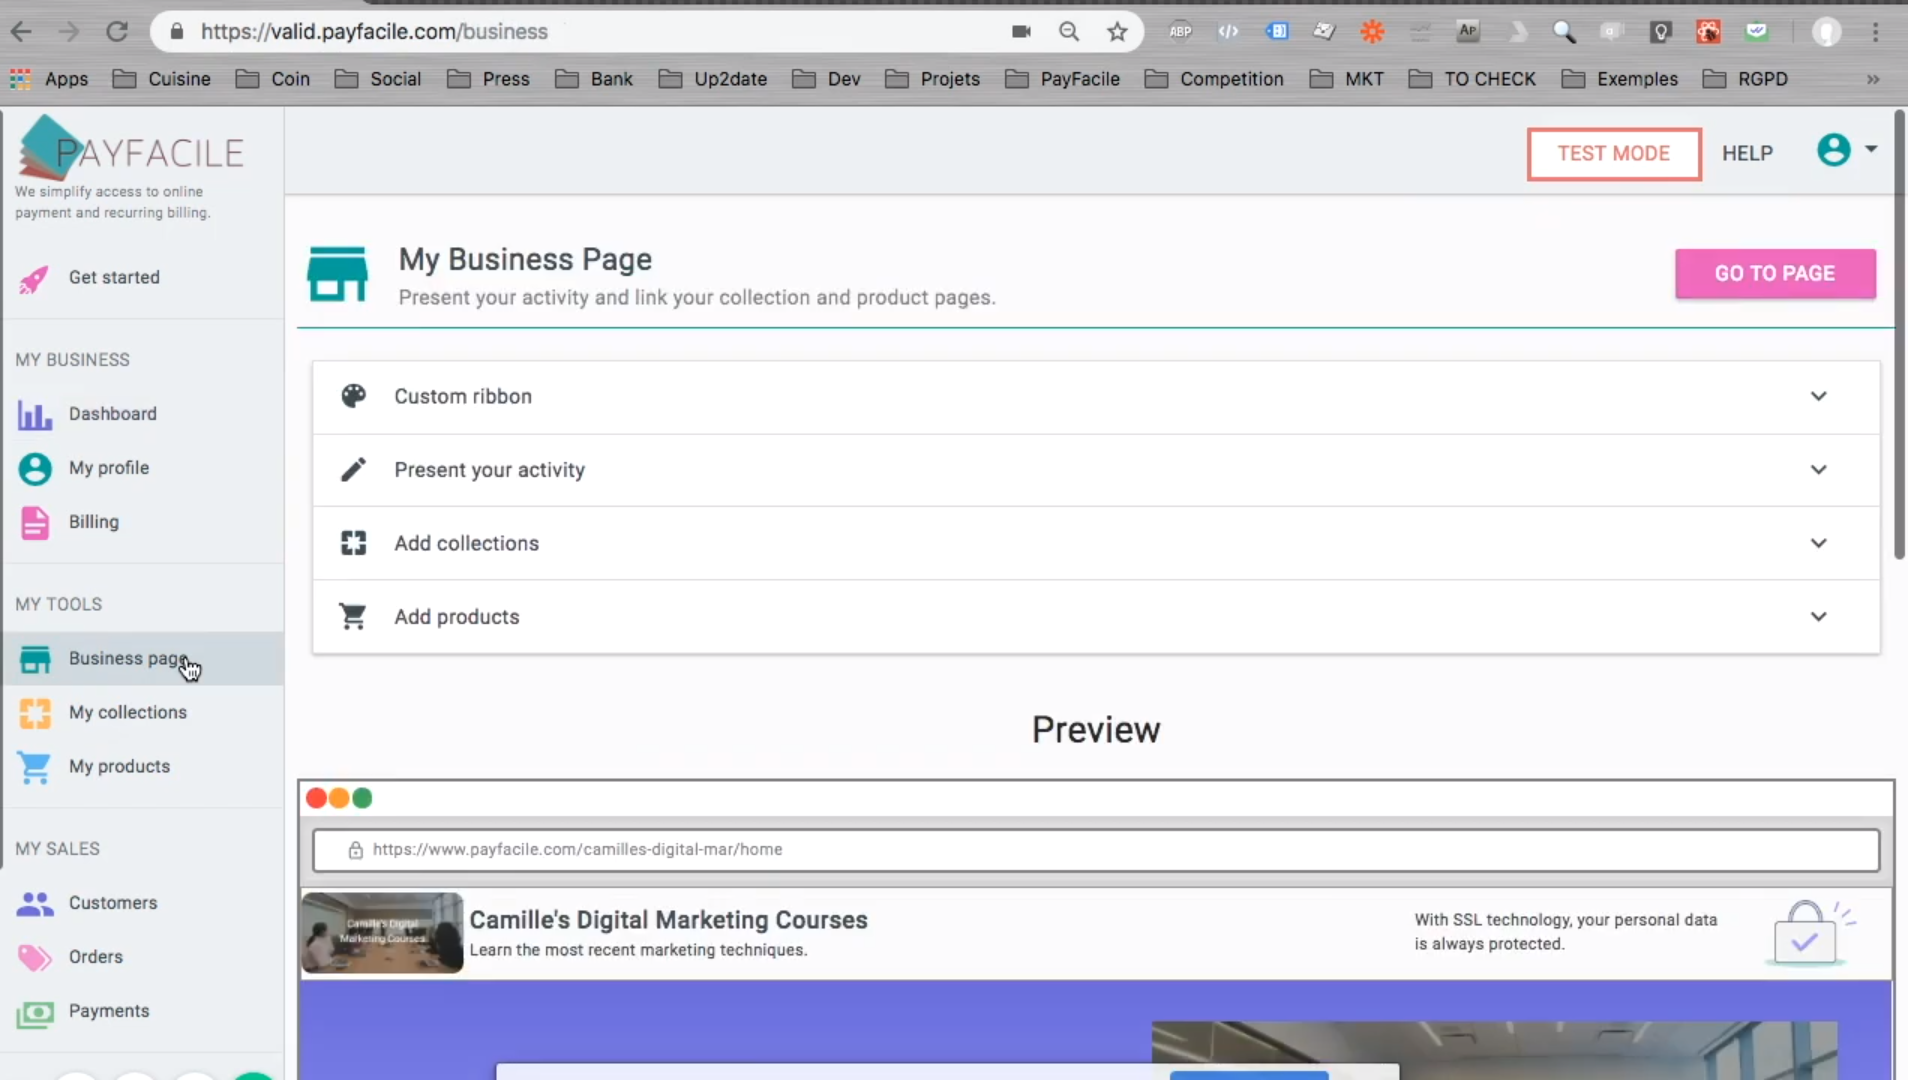 Payfacile screenshot: Payfacile business page